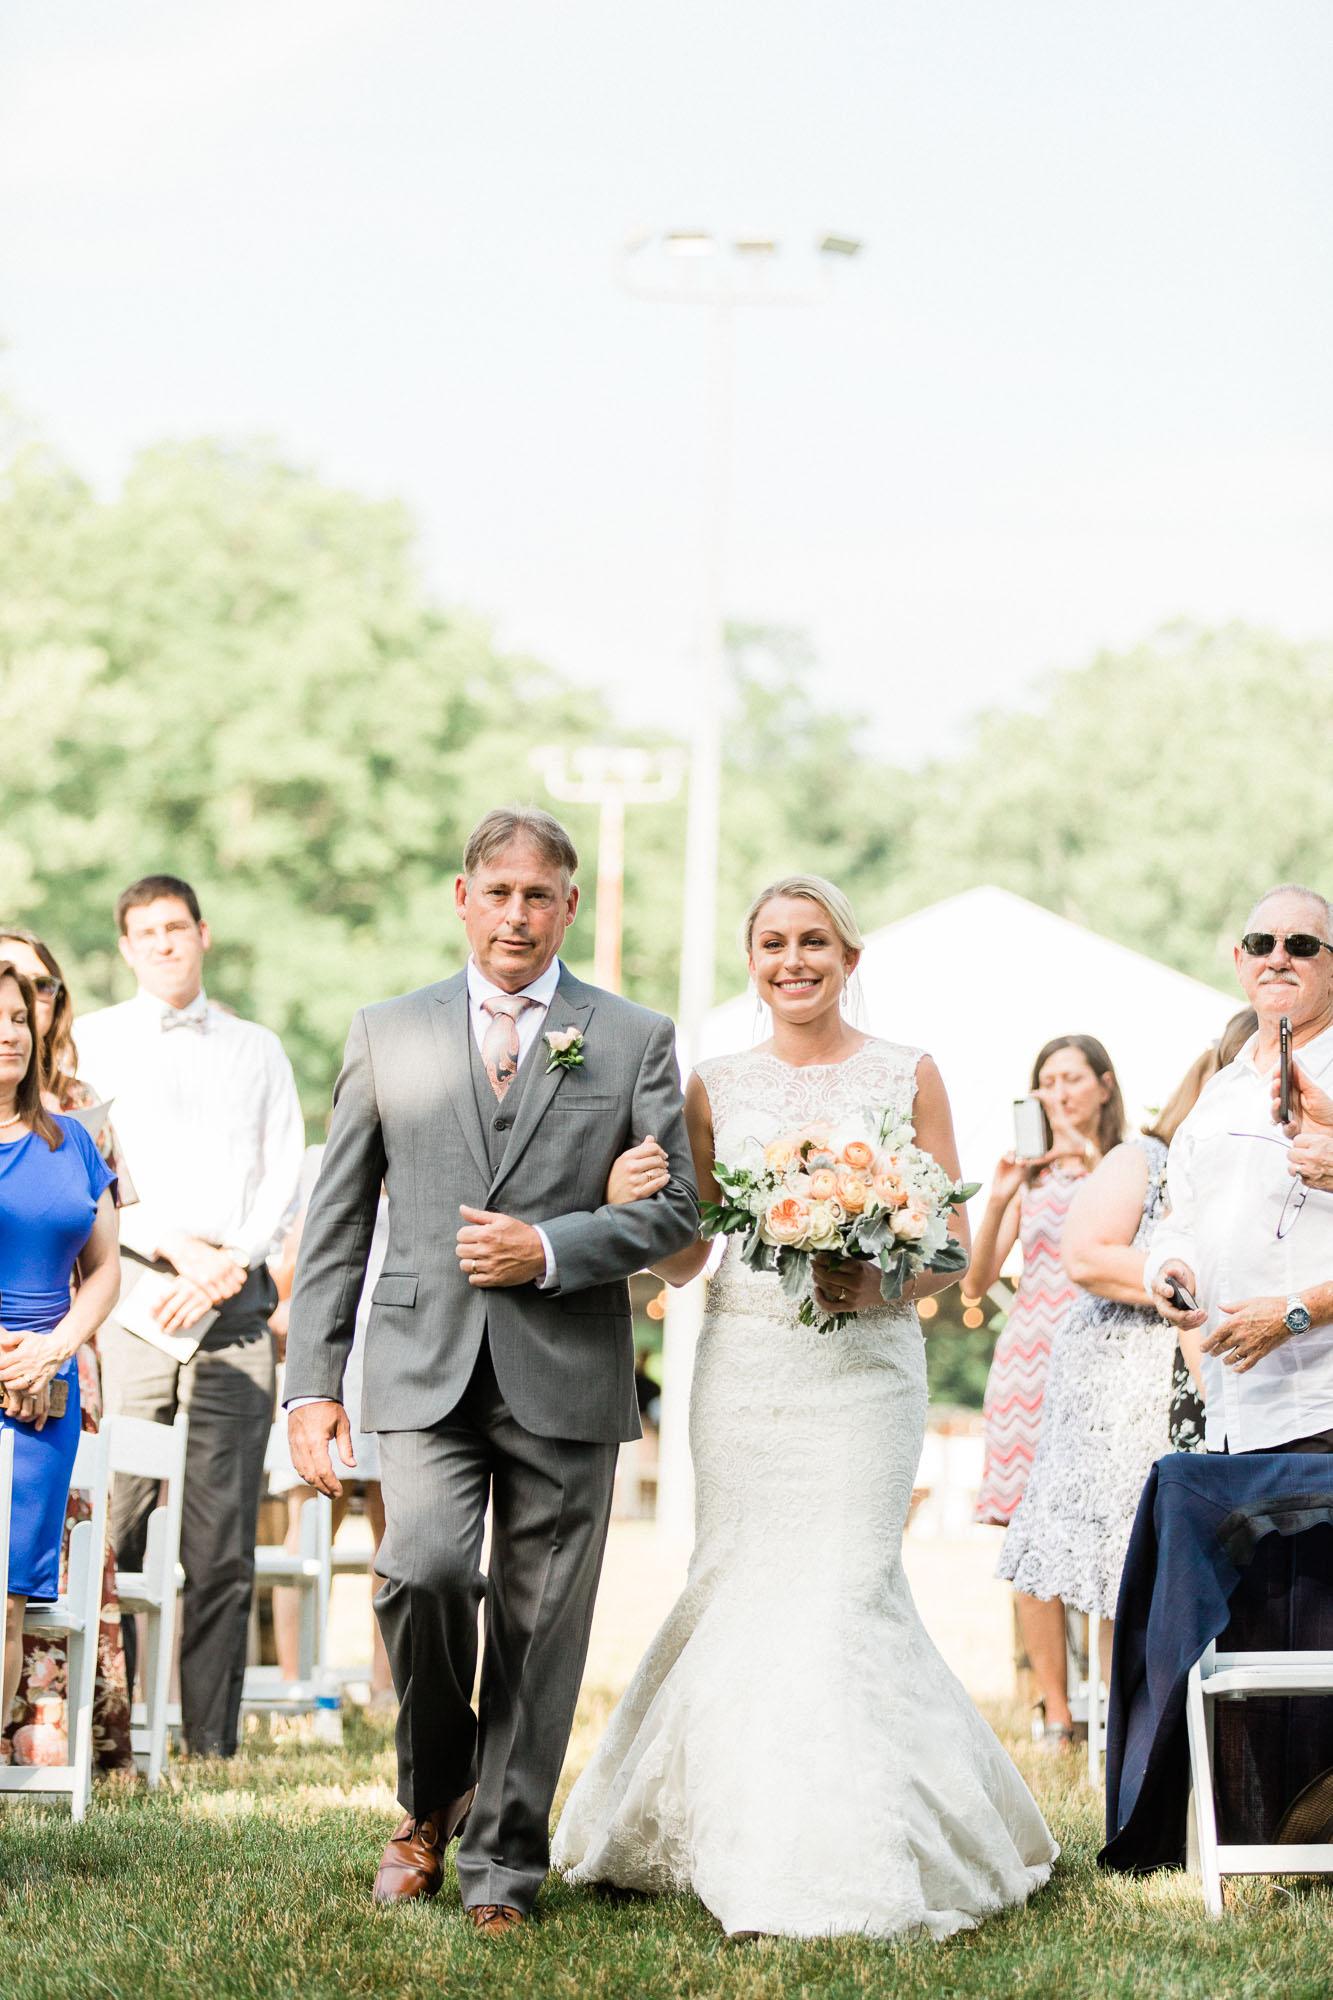 Allenberry-resort-historic-pennsylvania-wedding-21884.jpg